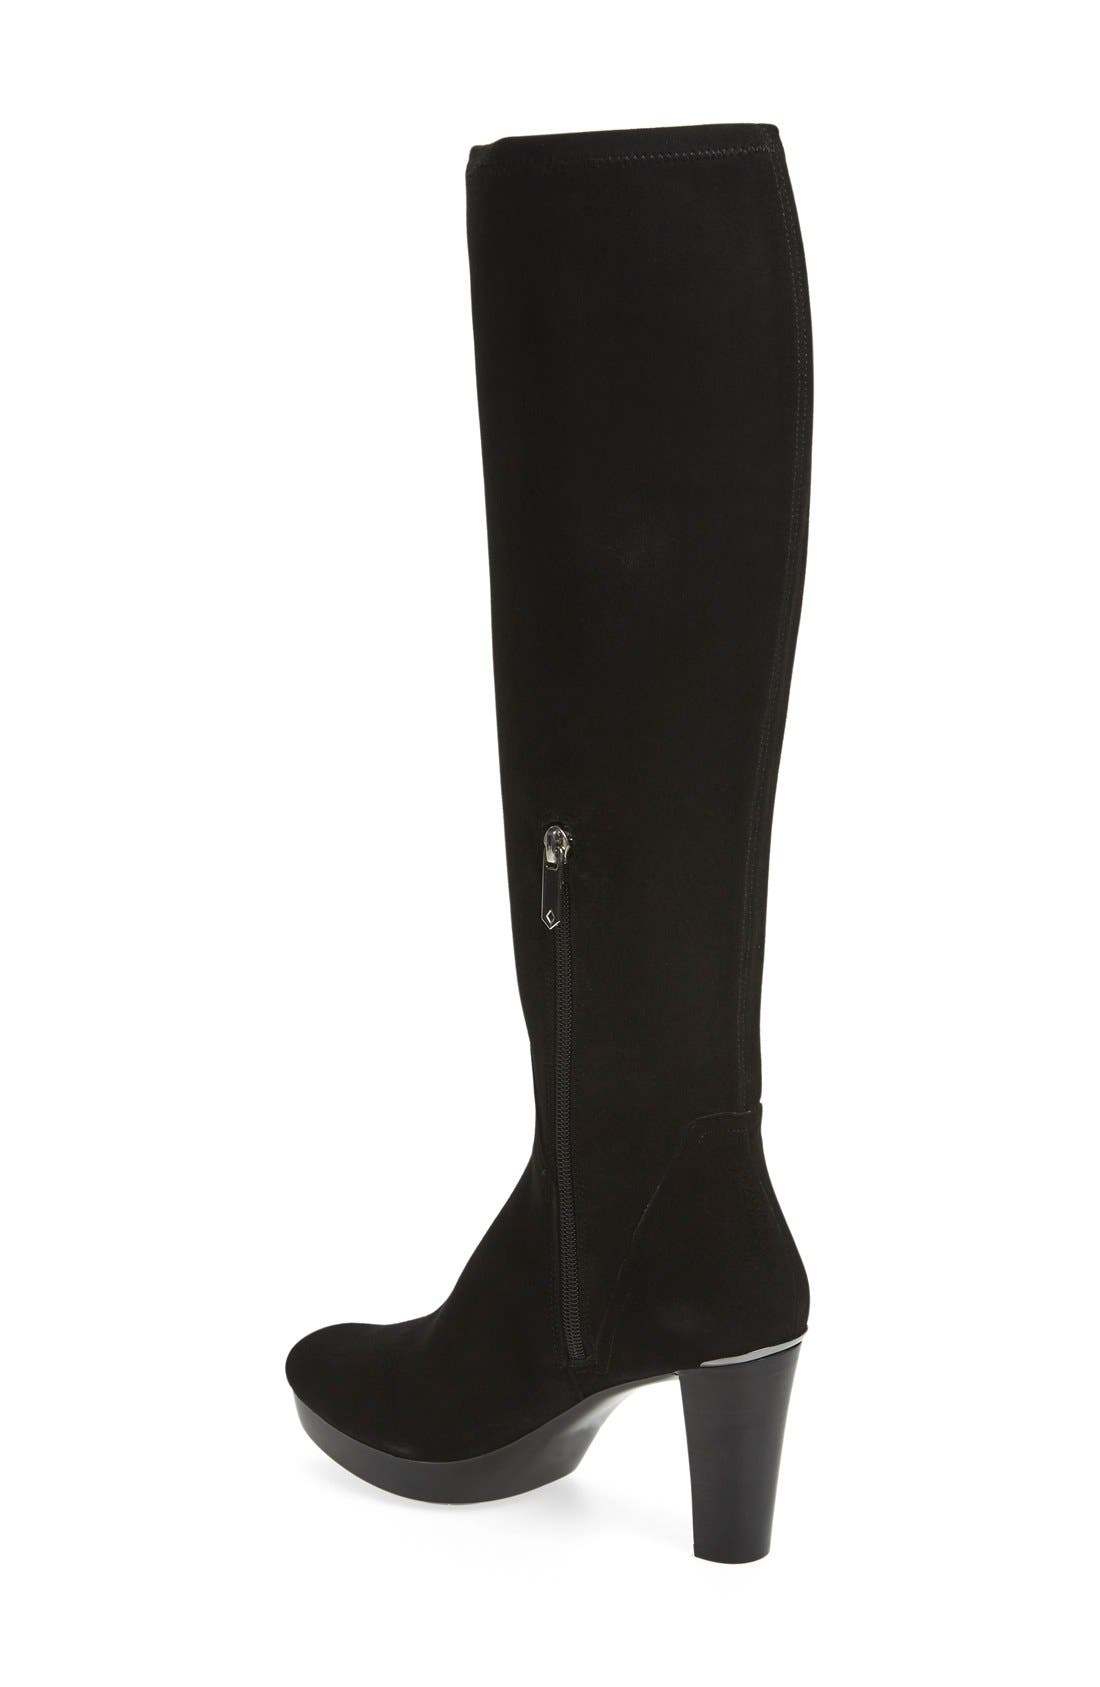 Alternate Image 2  - Donald J Pliner 'Echoe' Stretch Suede Tall Boot (Women)